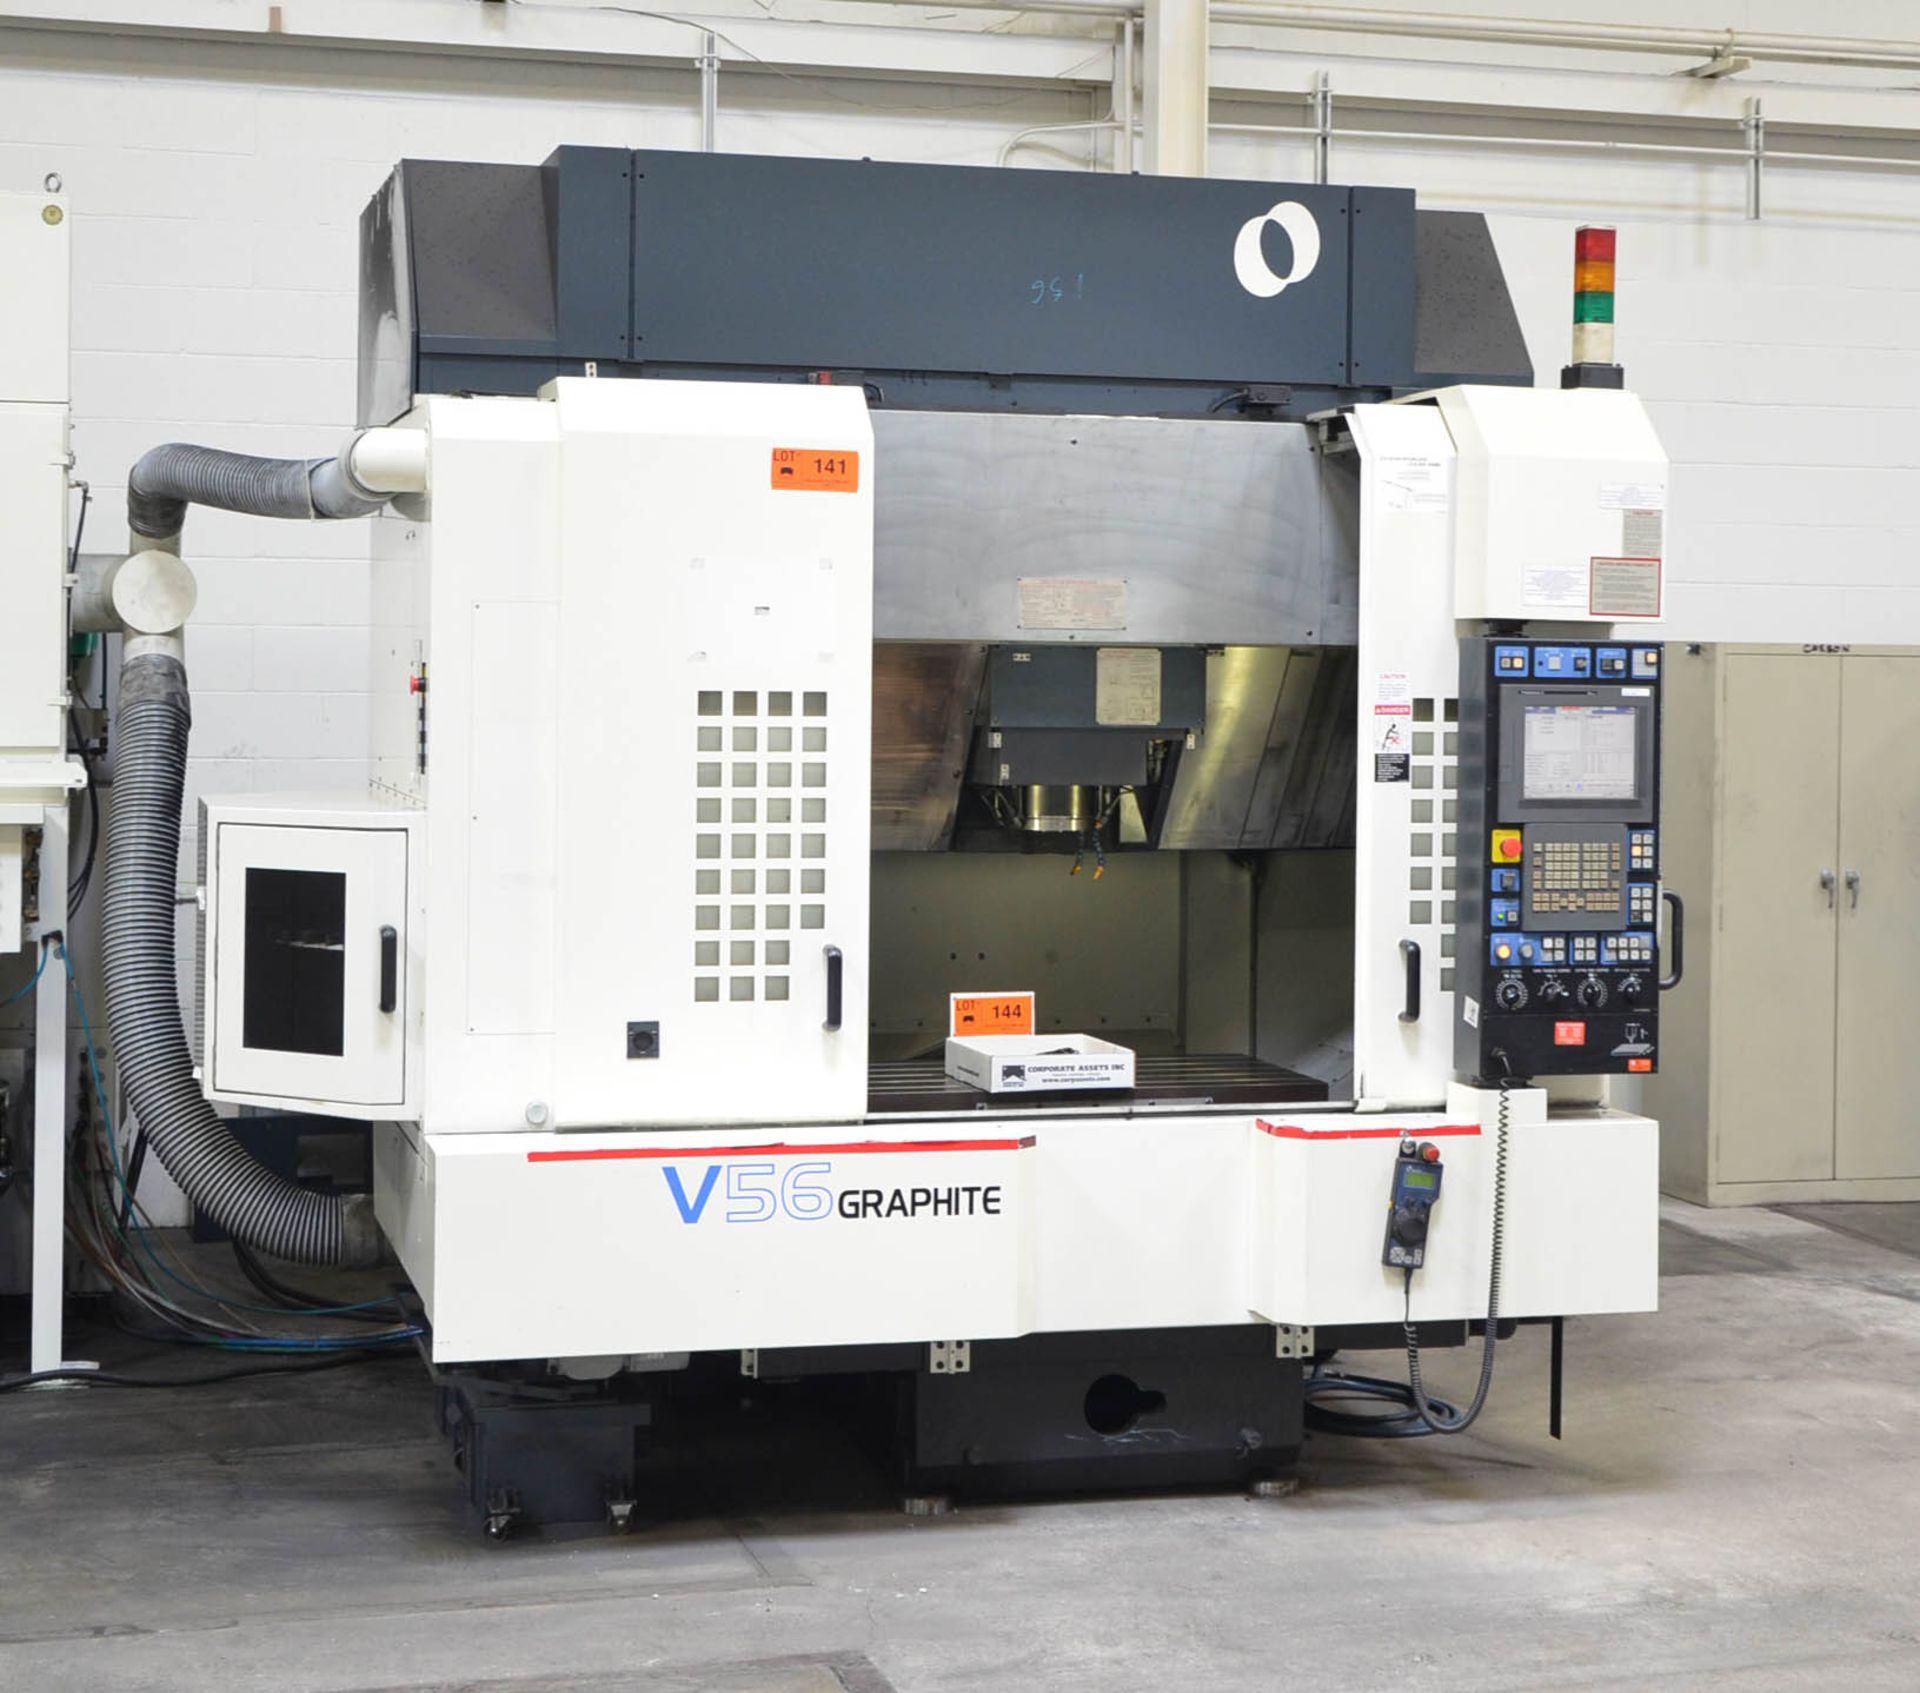 MAKINO (2008) V56 GRAPHITE CNC VERTICAL MACHINING CENTER WITH MAKINO PROFESSIONAL 5 TOUCHSCREEN - Image 3 of 10